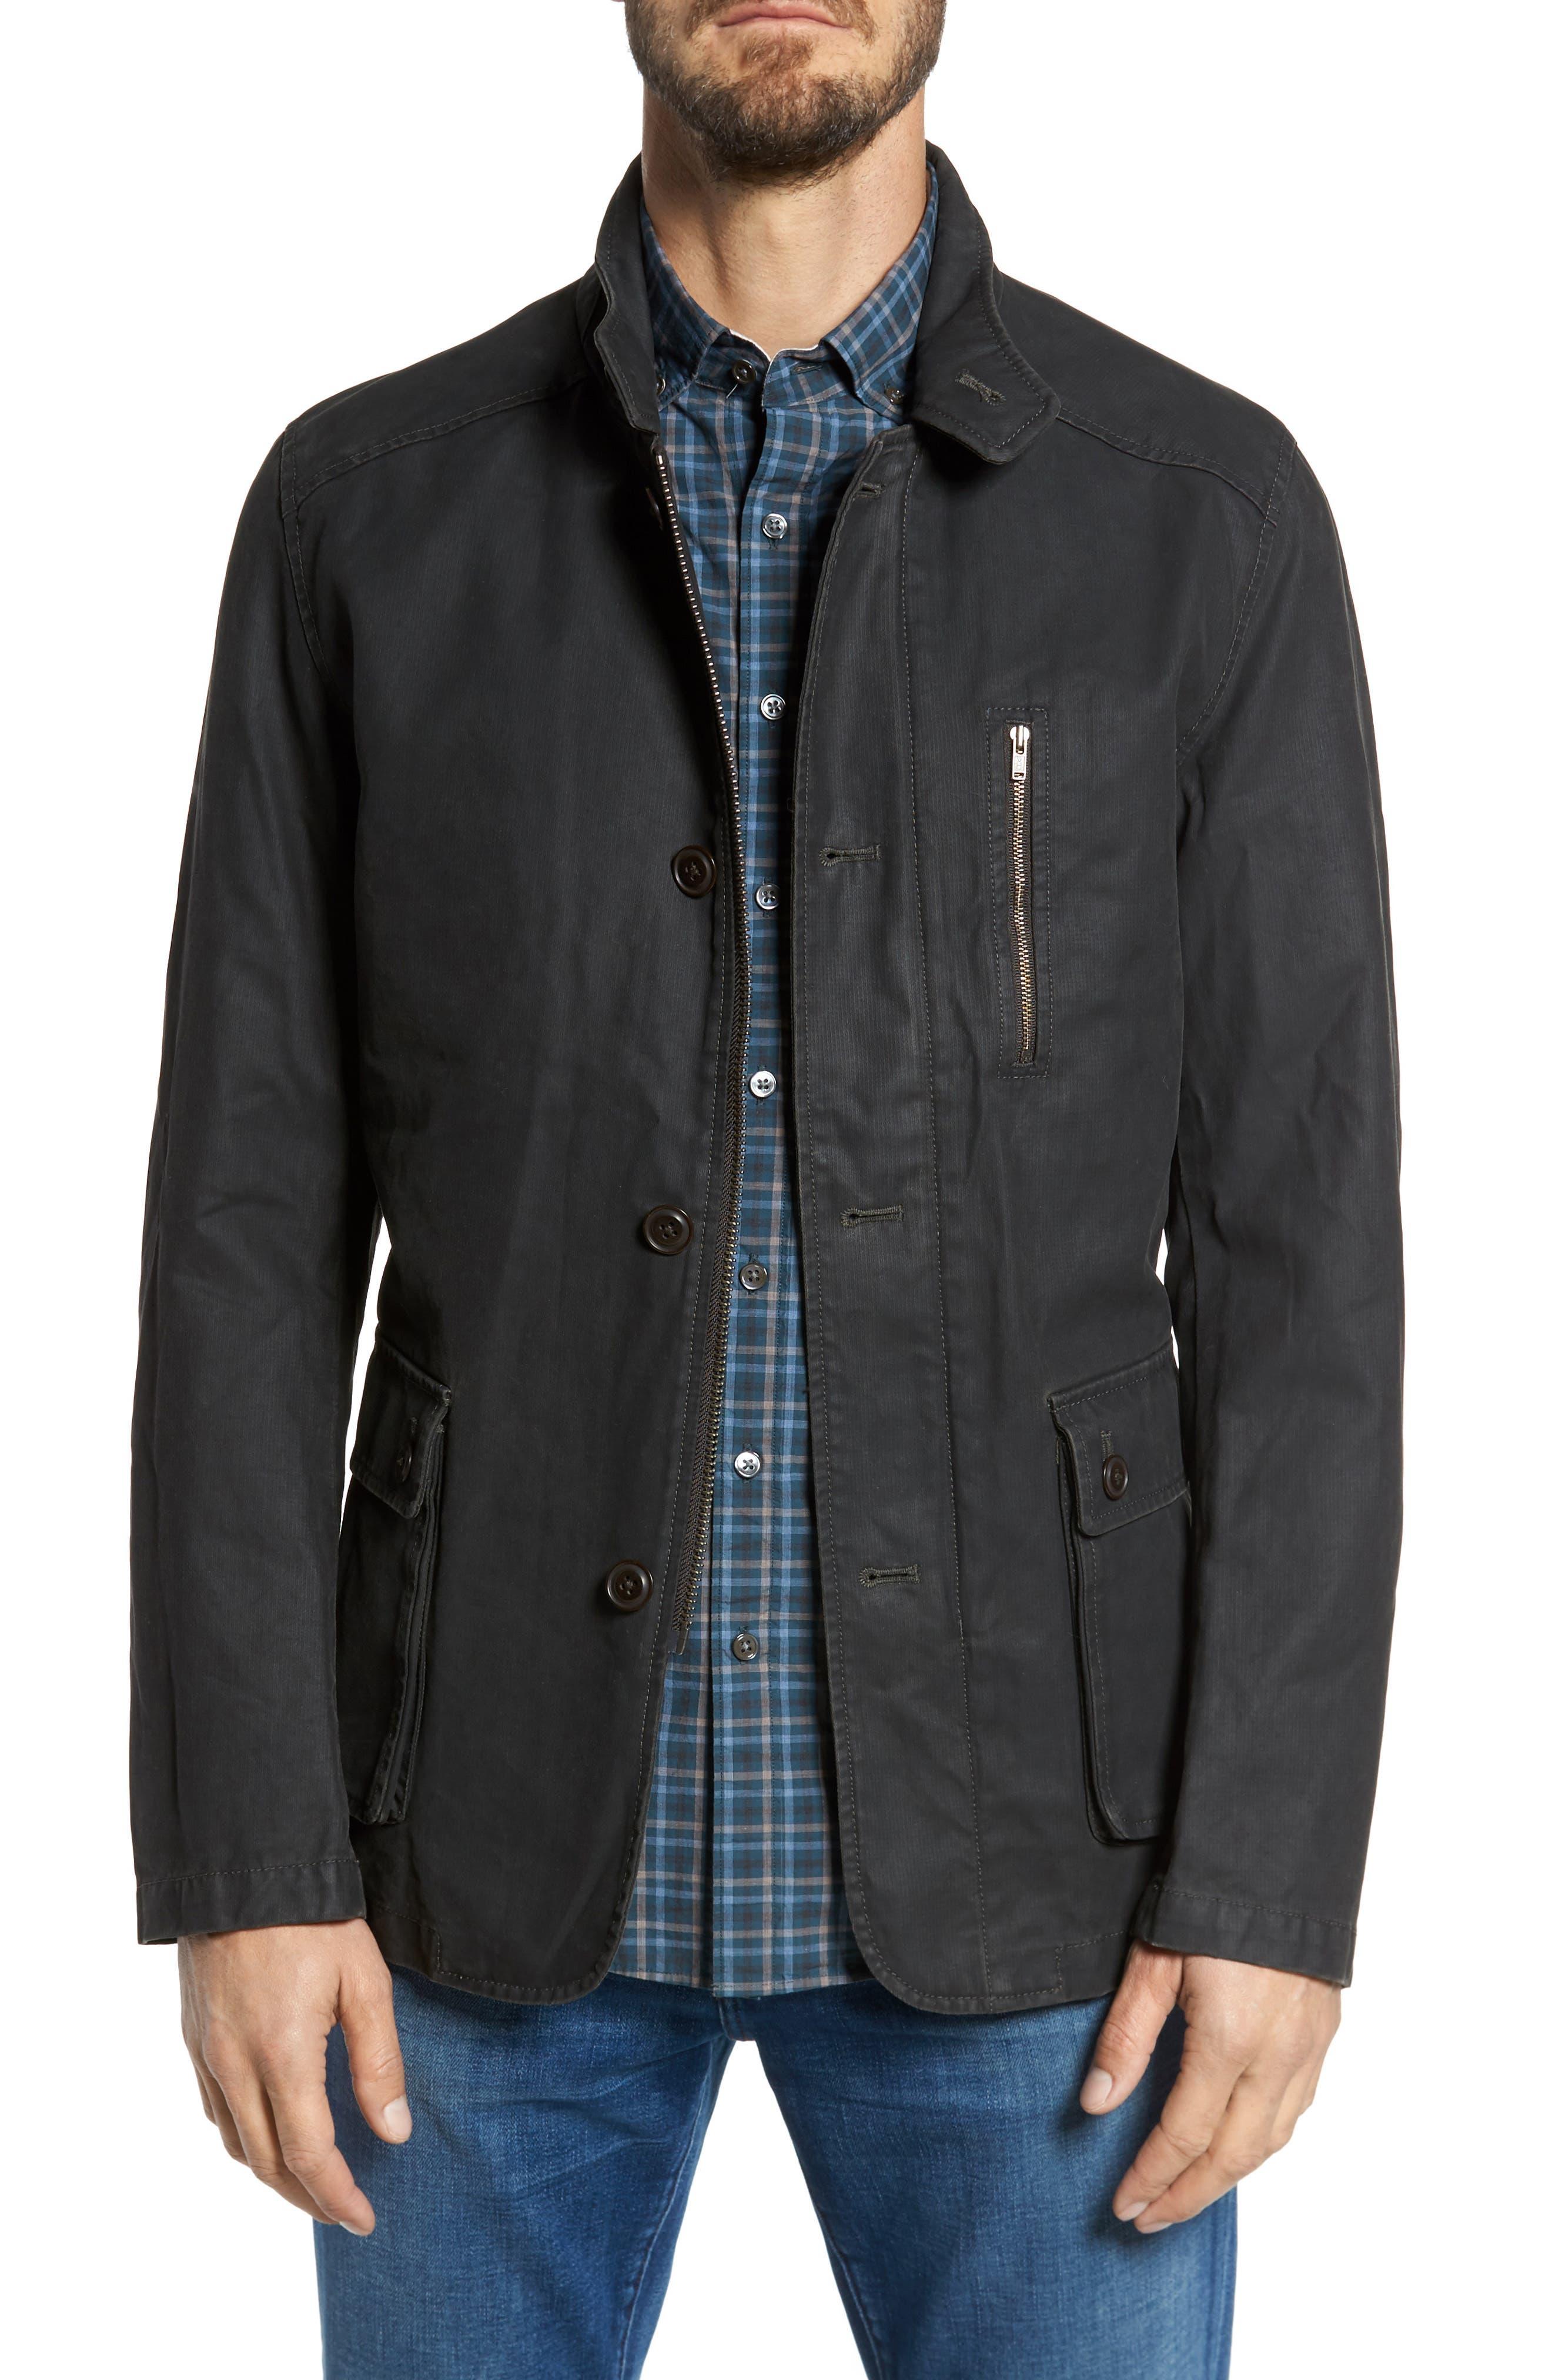 Rodd & Gunn Blackmount Water-Resistant Jacket